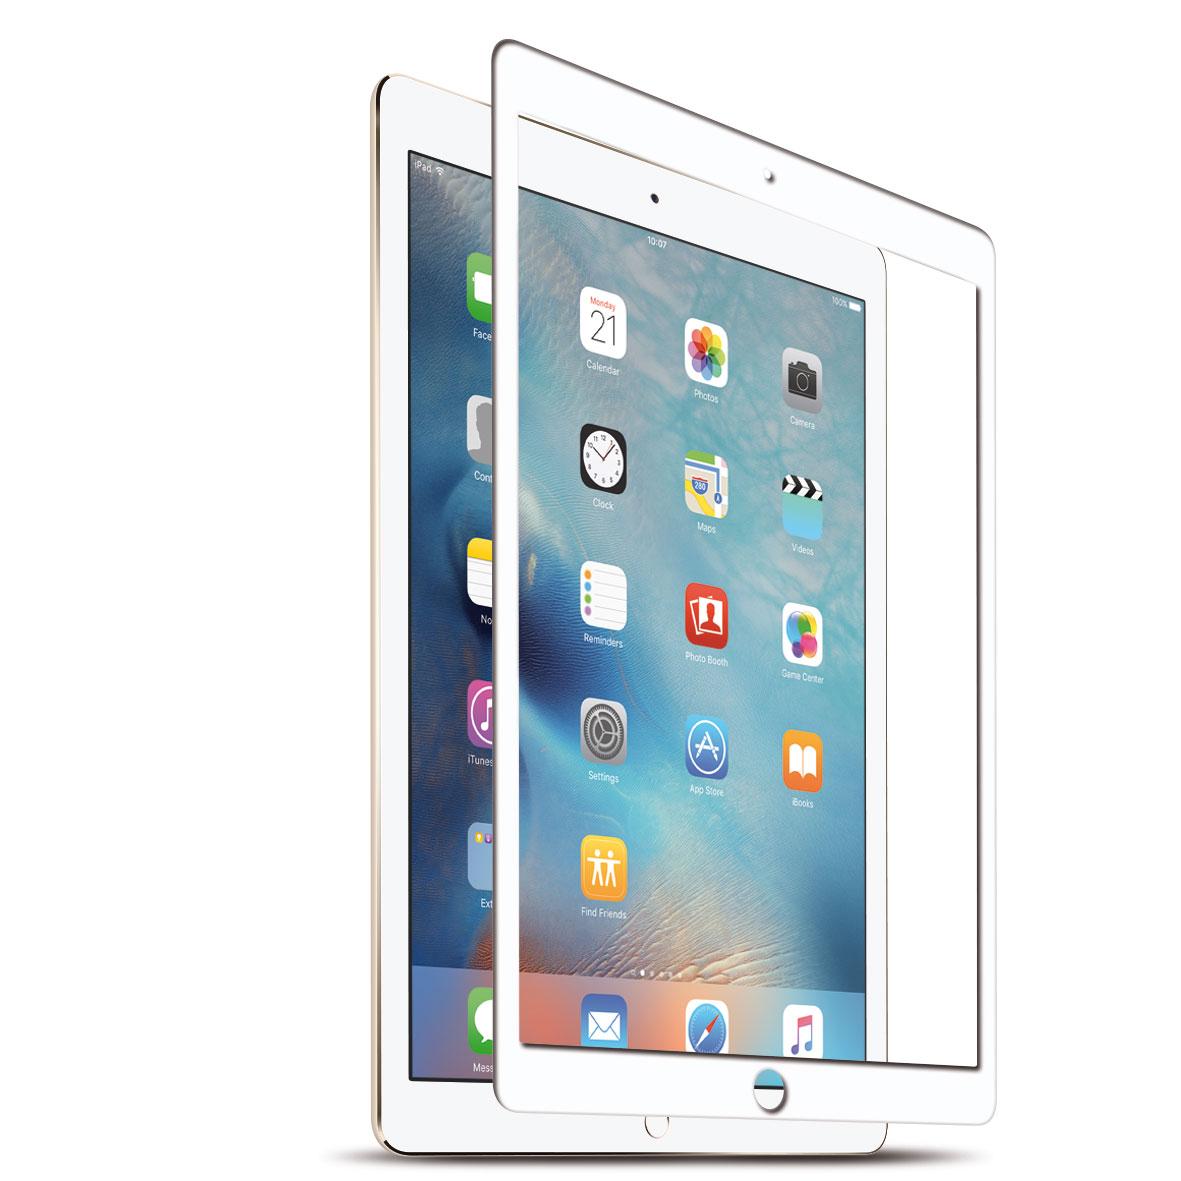 "KMP Protective Glass Schutzfolie für iPad Air, Air 2, Pro 9,7"", weiß"